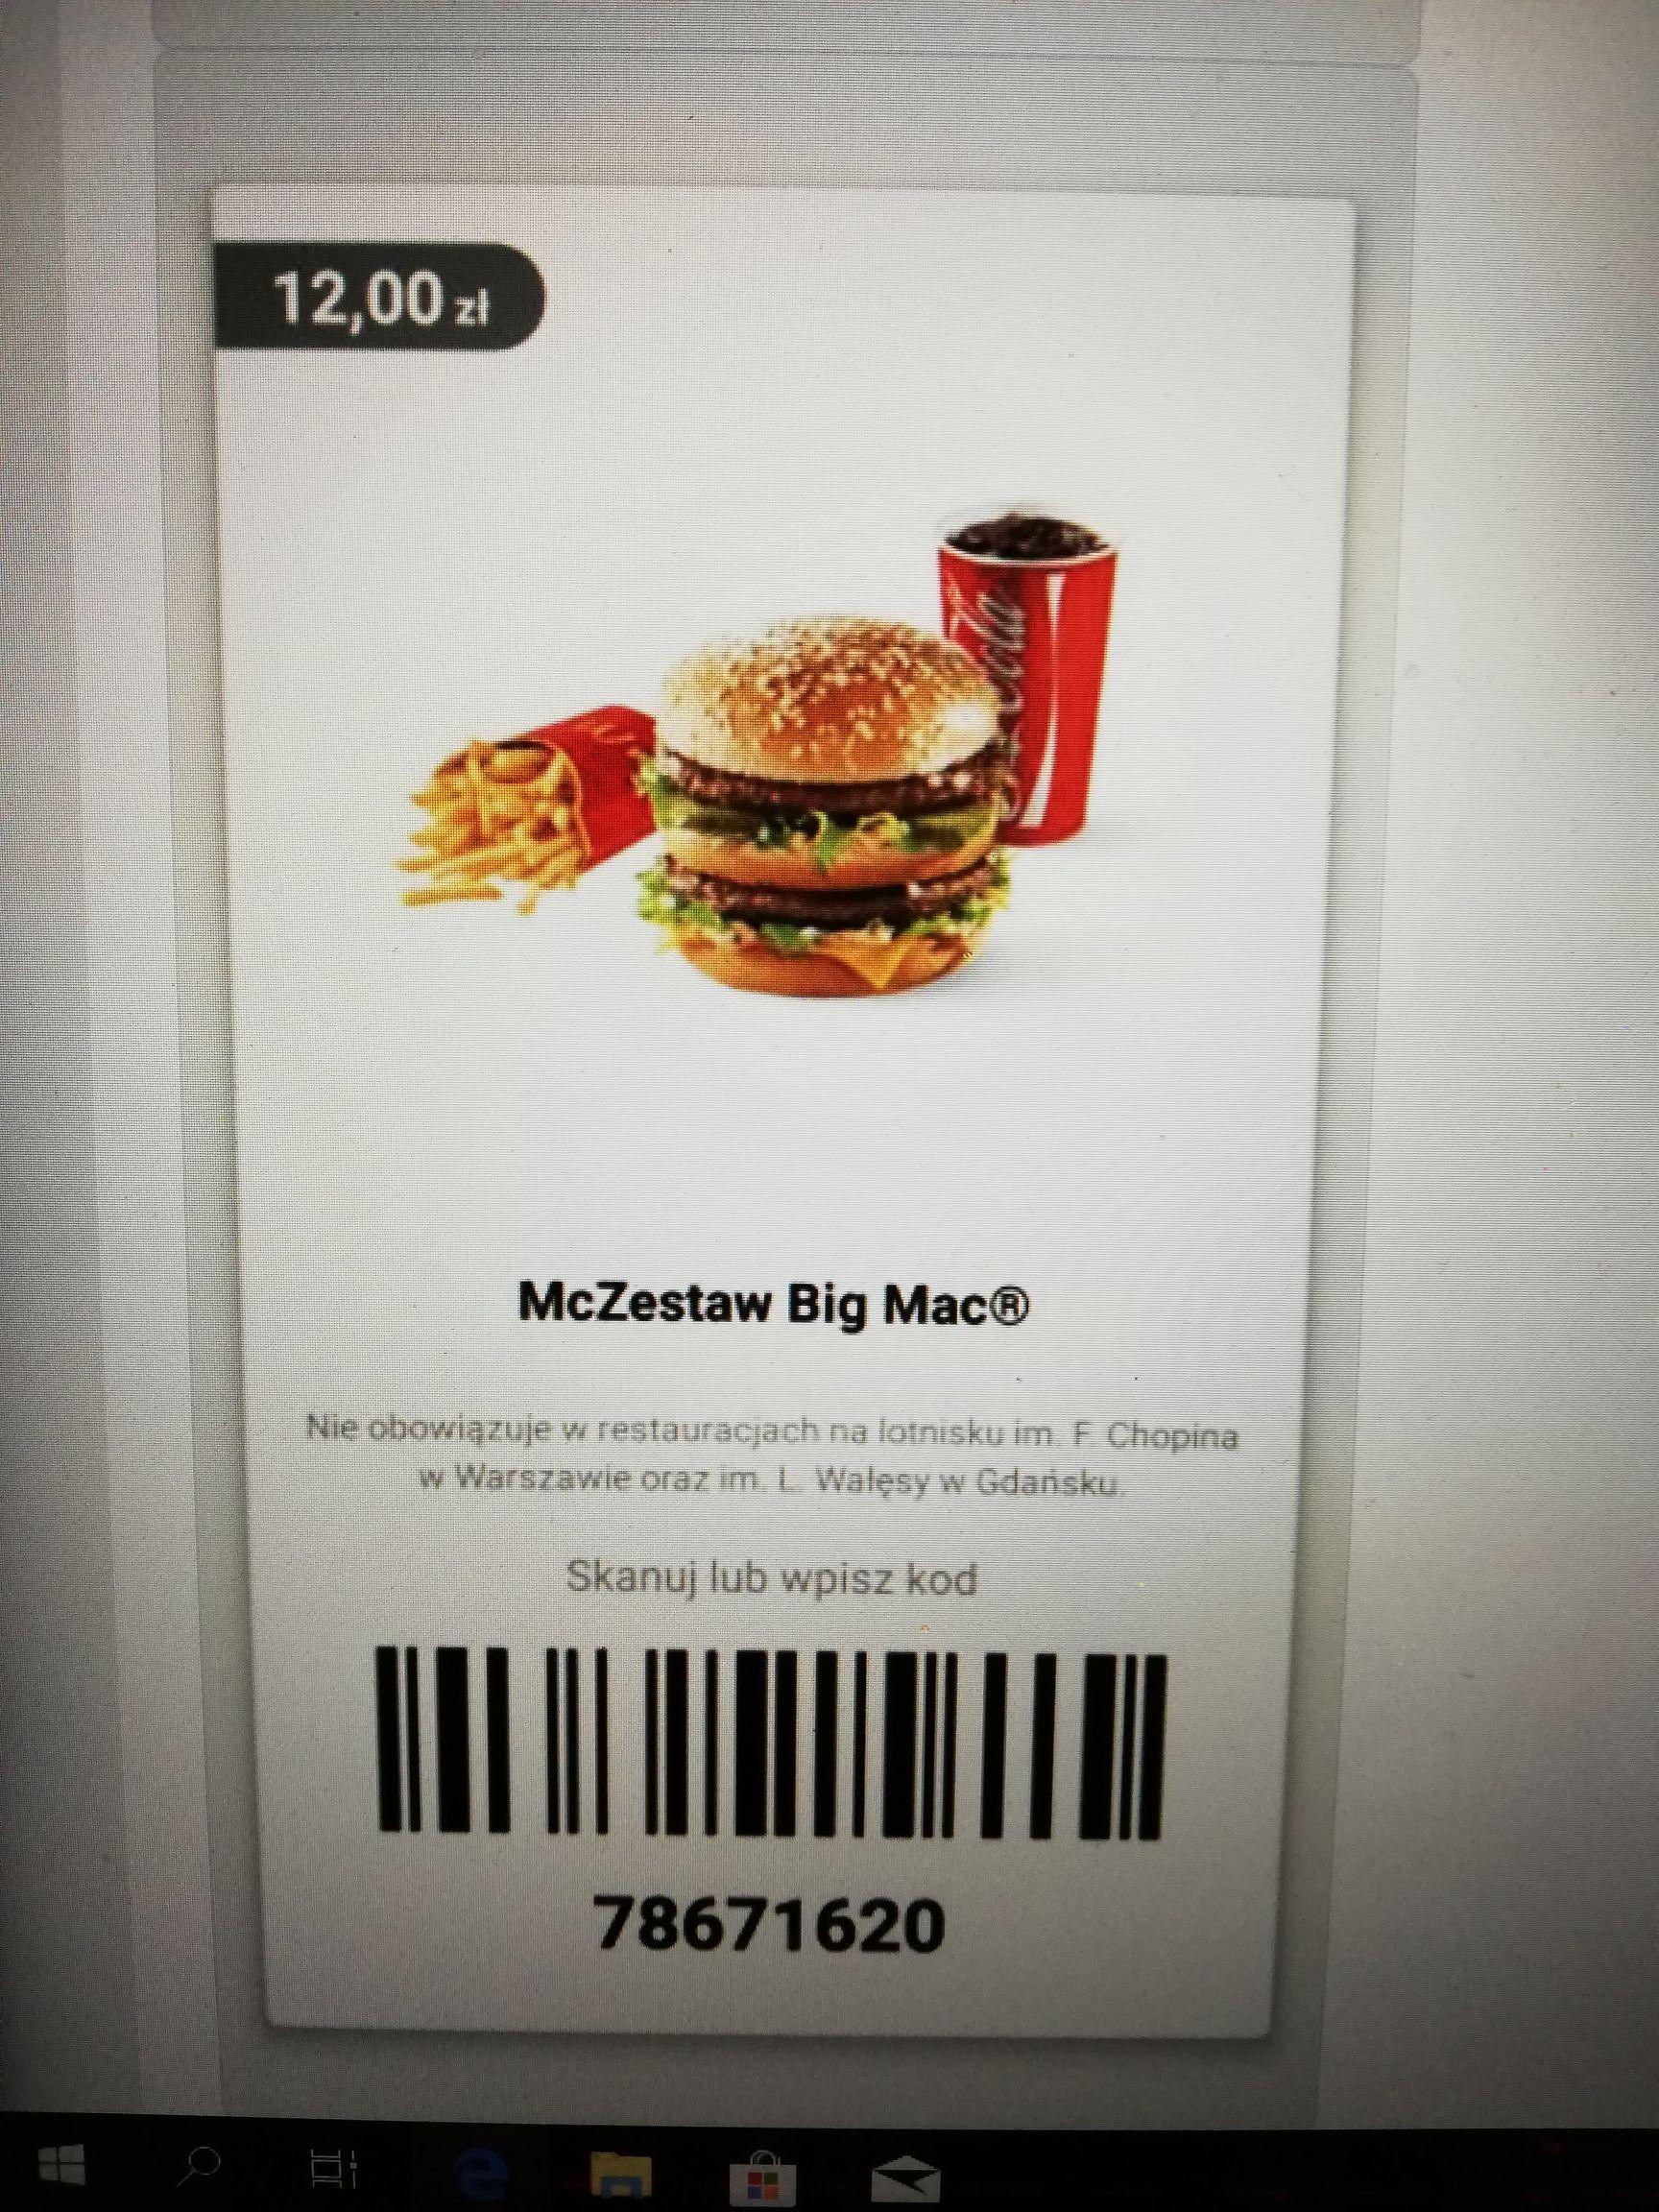 McZestaw Big Mac